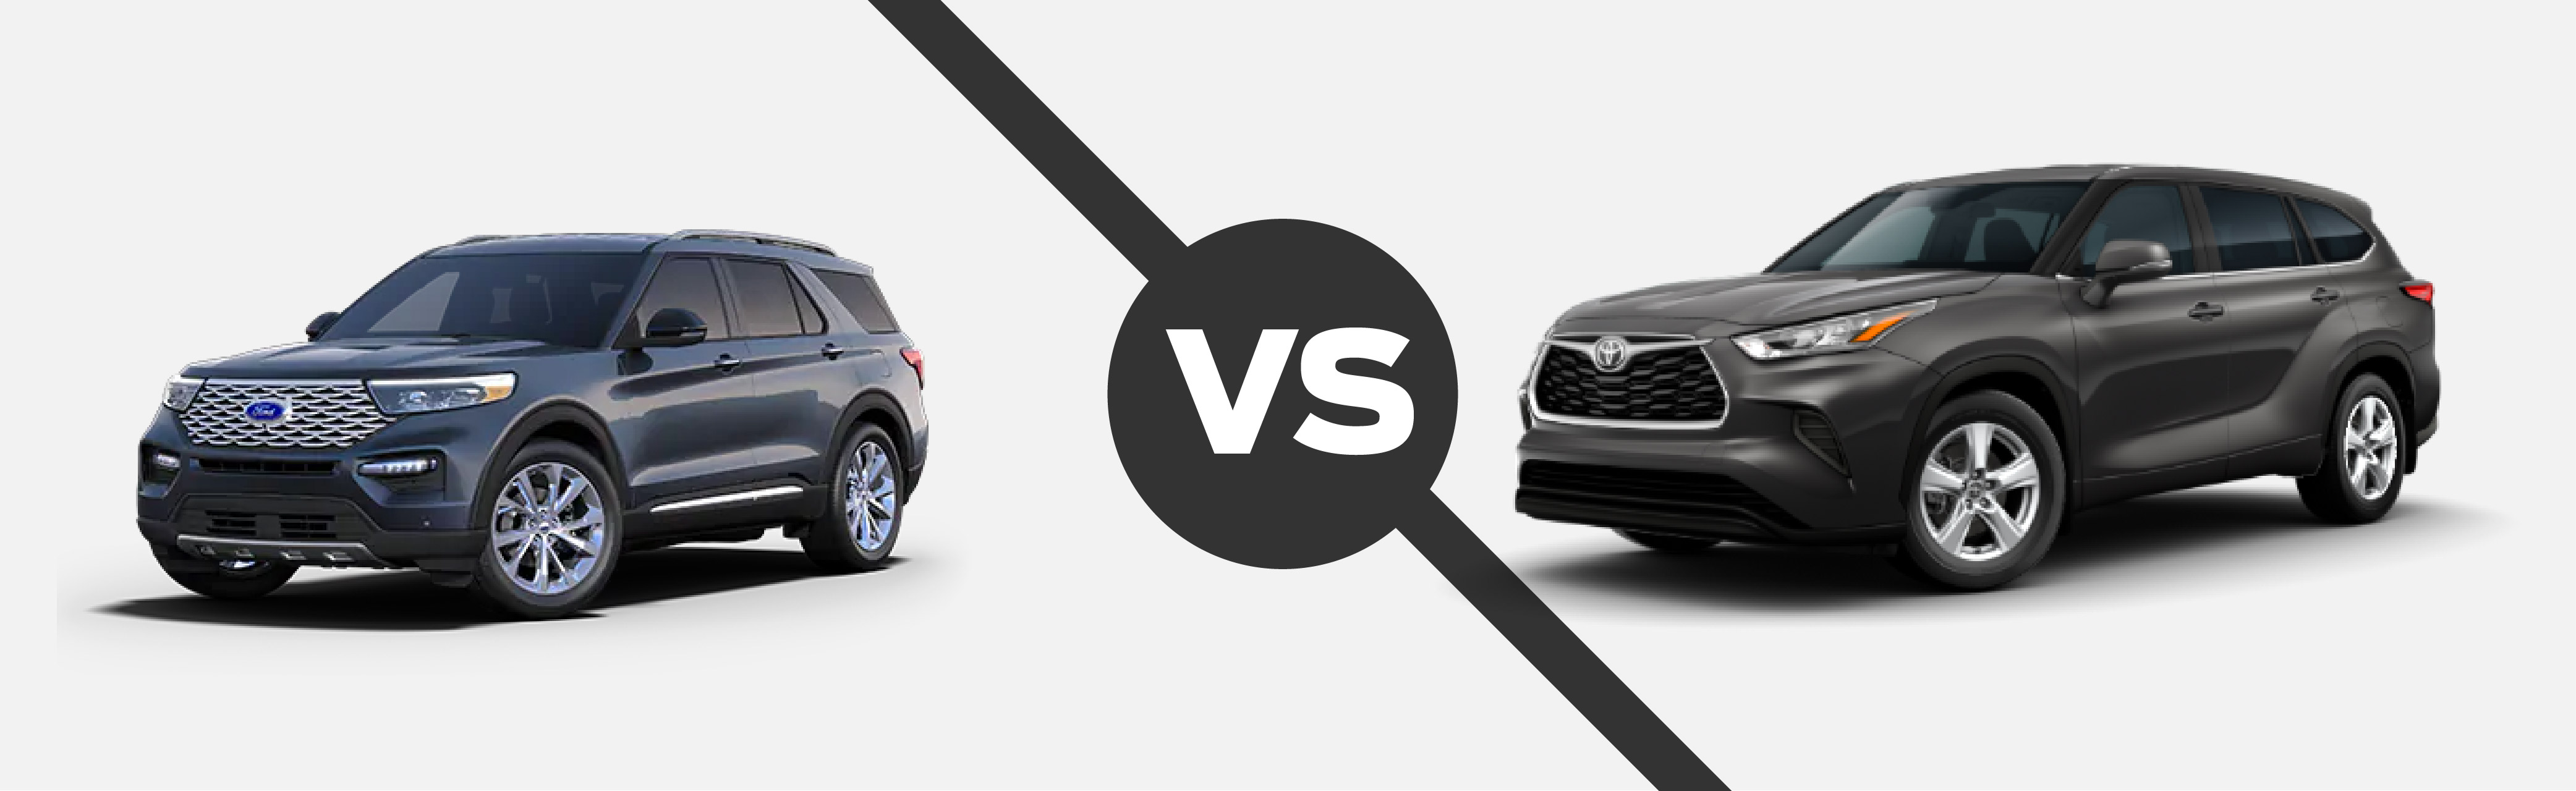 2021 Ford Explorer vs 2021 Toyota Highlander